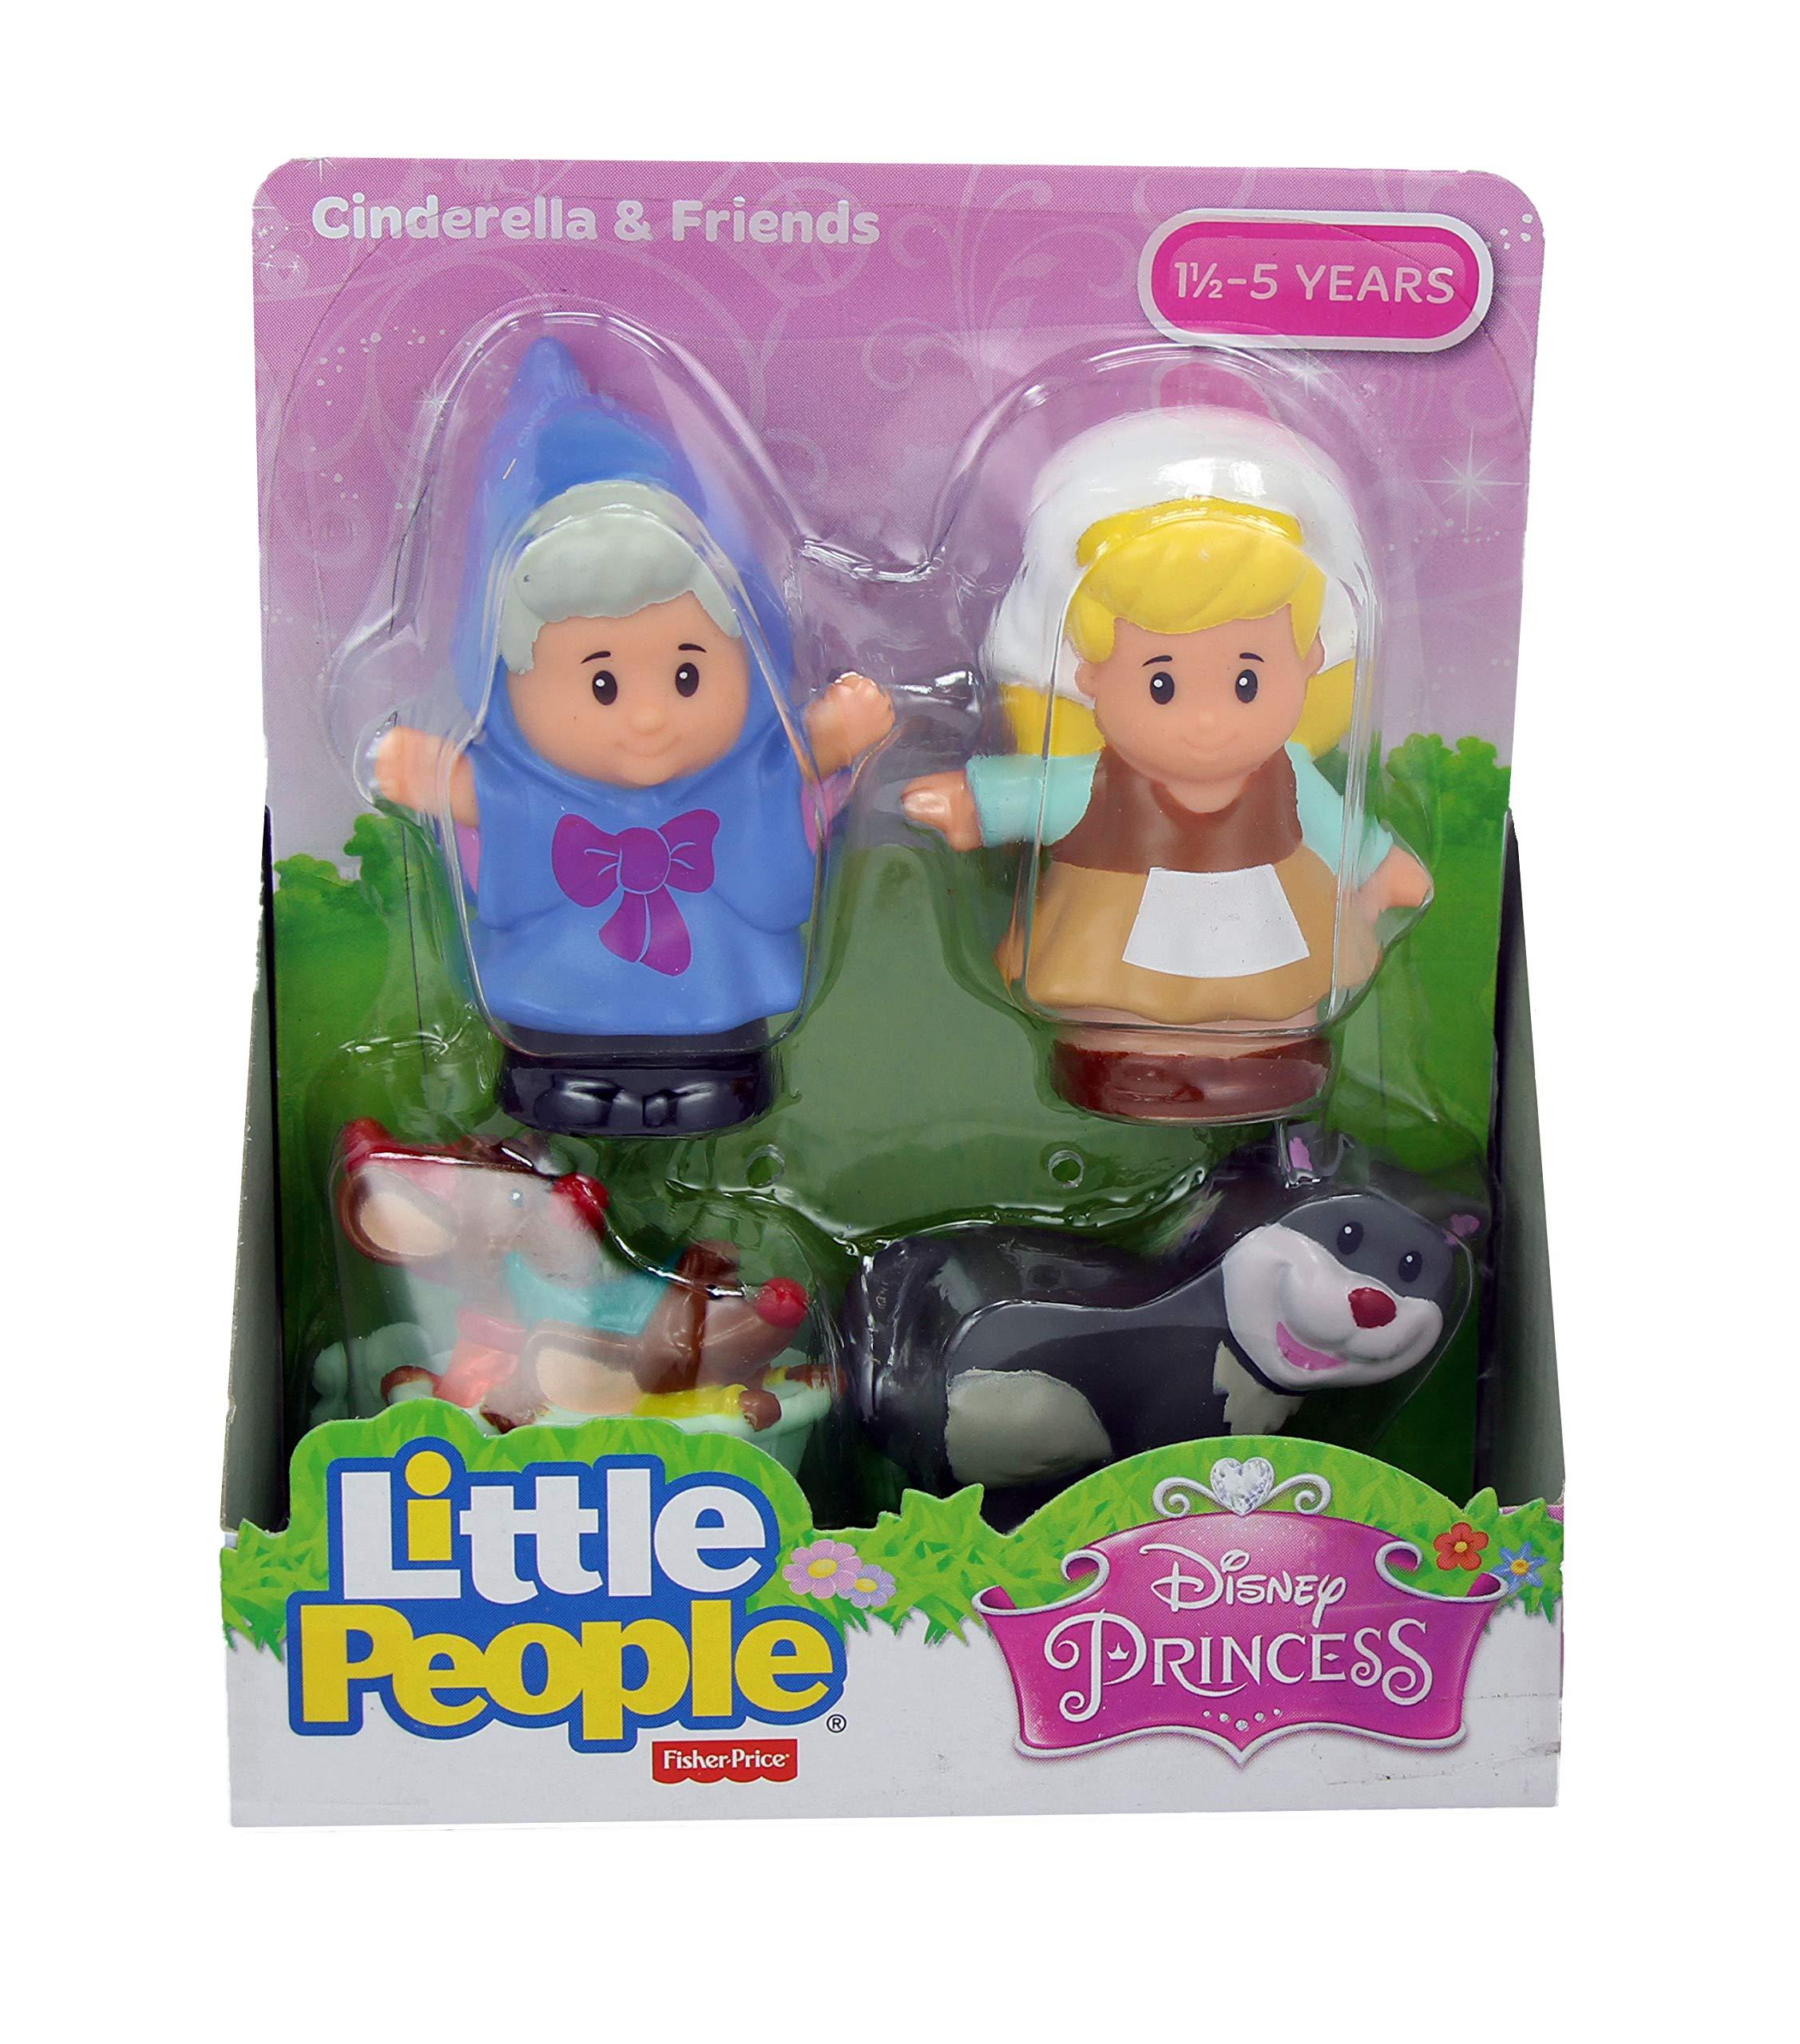 Fisher Price Little People Disney Princess & Friends Figure Set of 4 - Belle, Cinderella, Jasmin & Rapunzel by Disney Princess (Image #4)